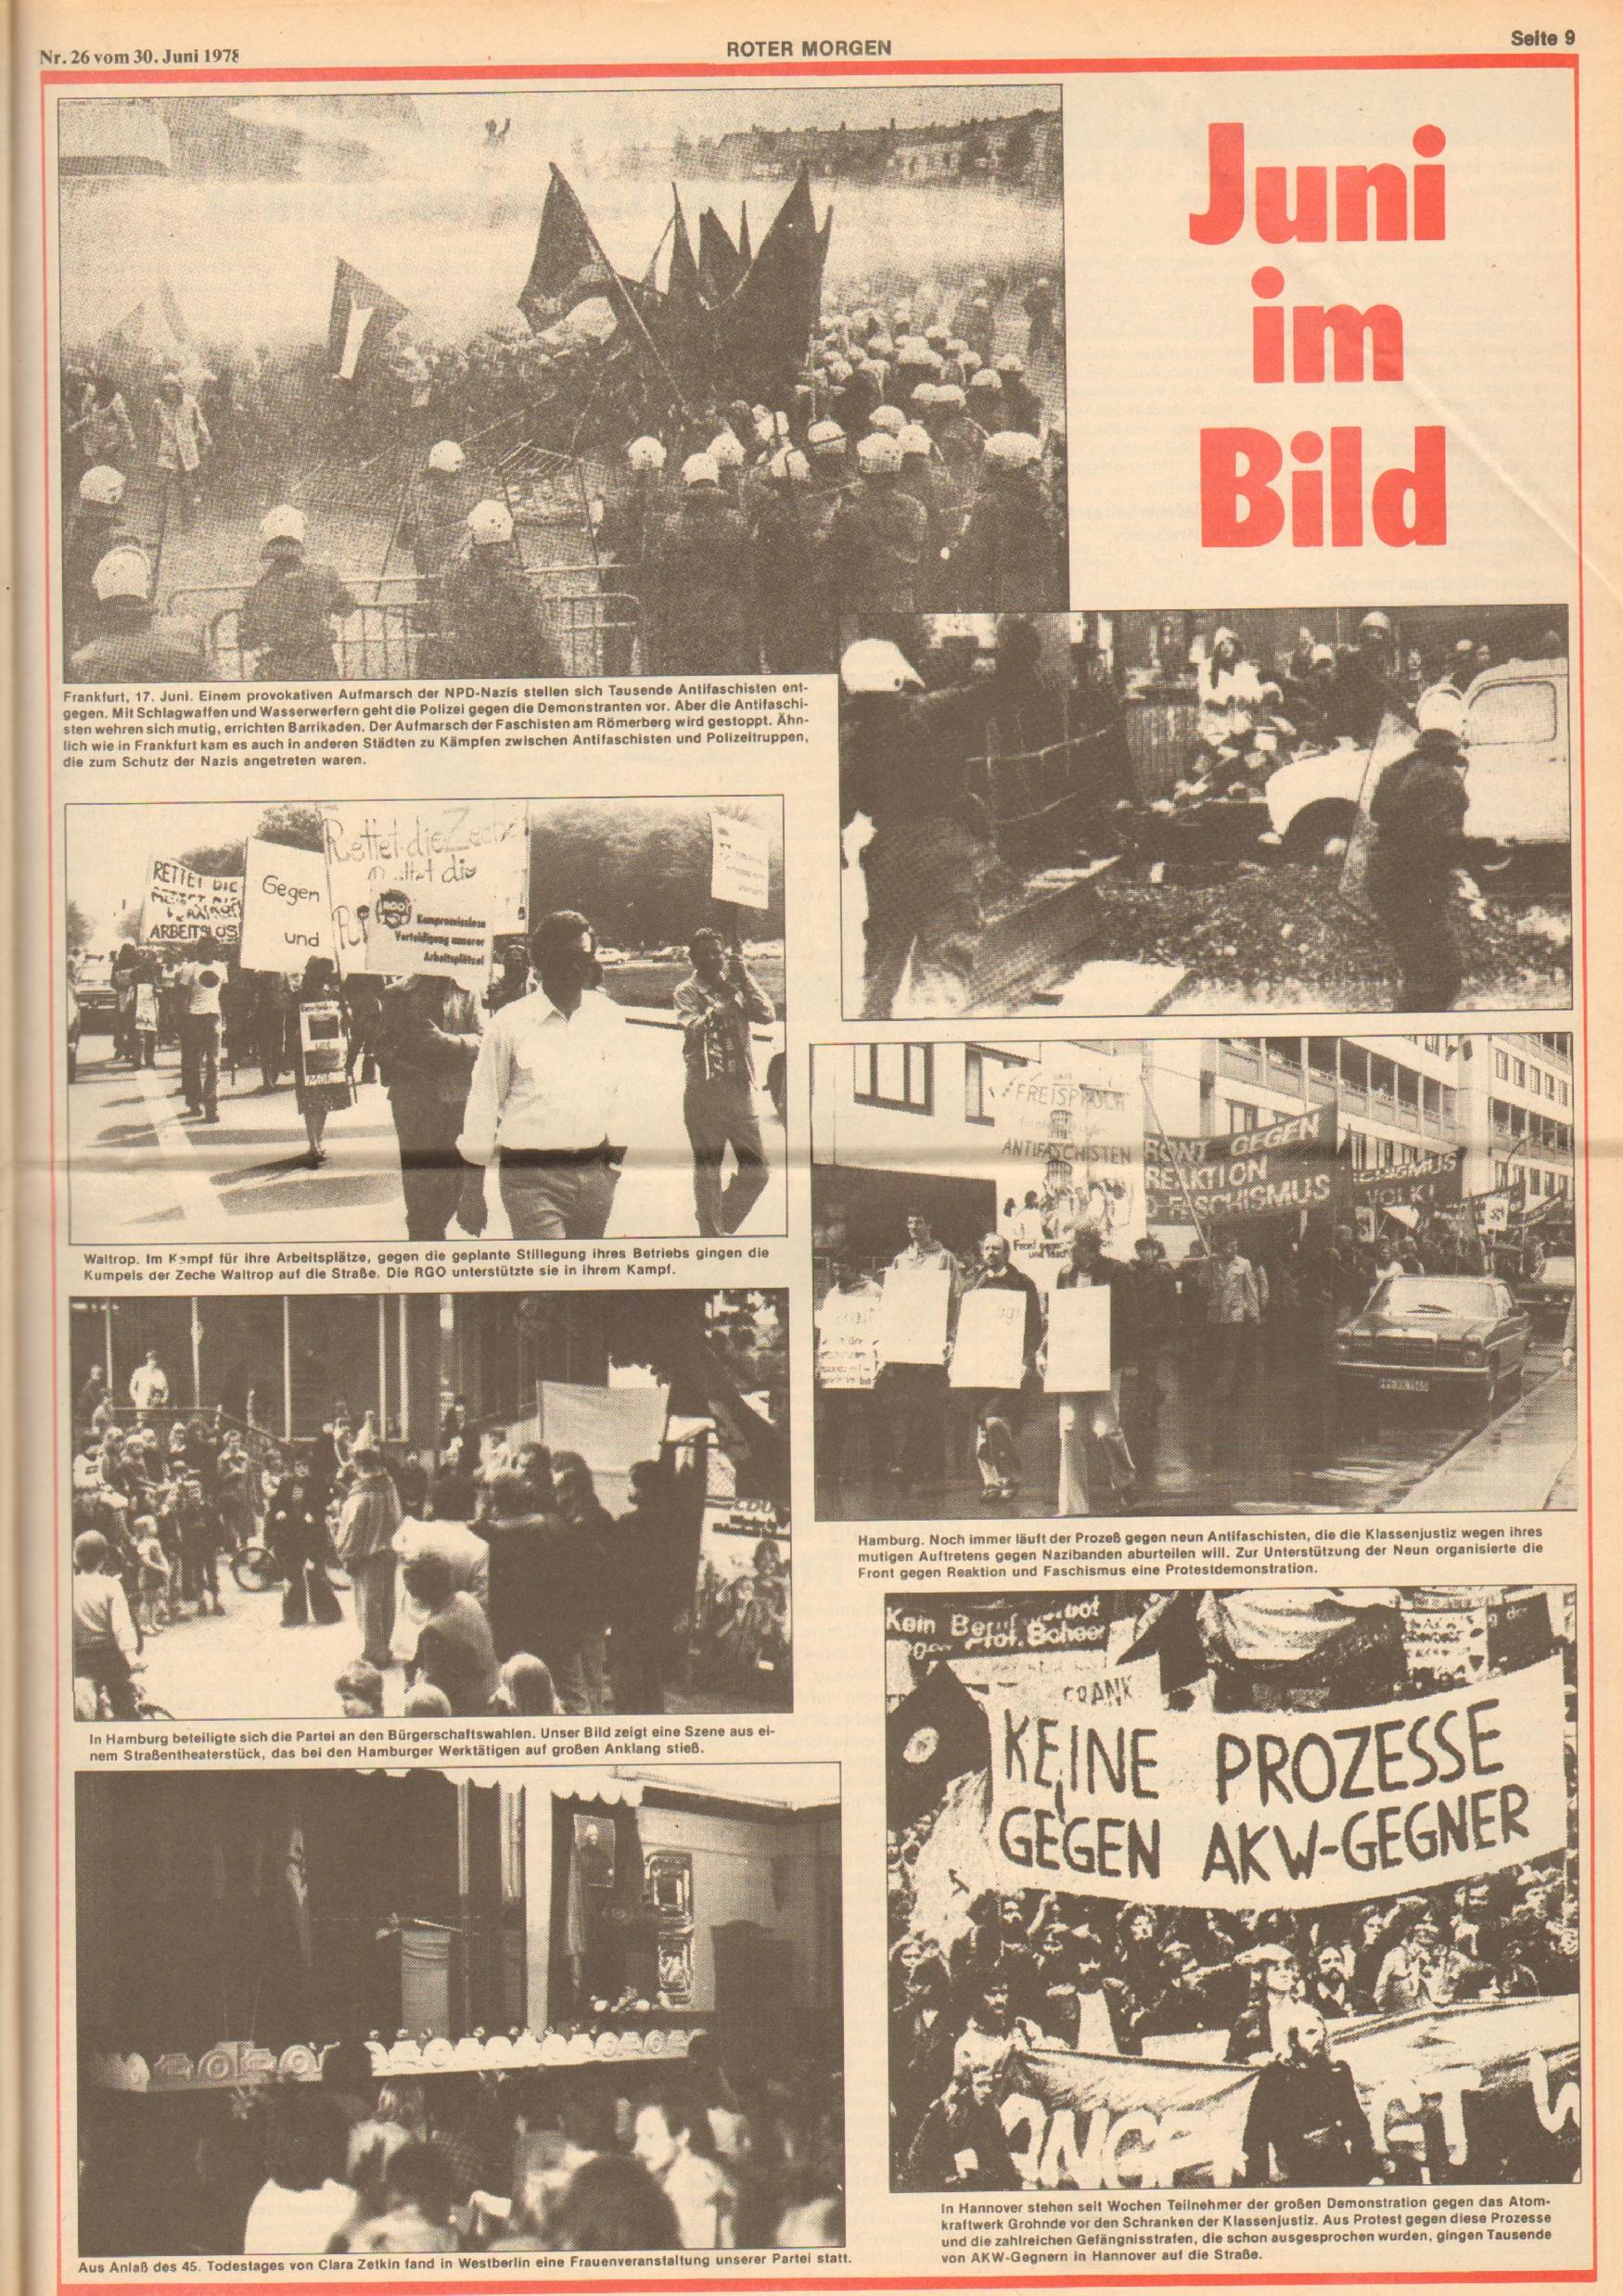 Roter Morgen, 12. Jg., 30. Juni 1978, Nr. 26, Seite 9